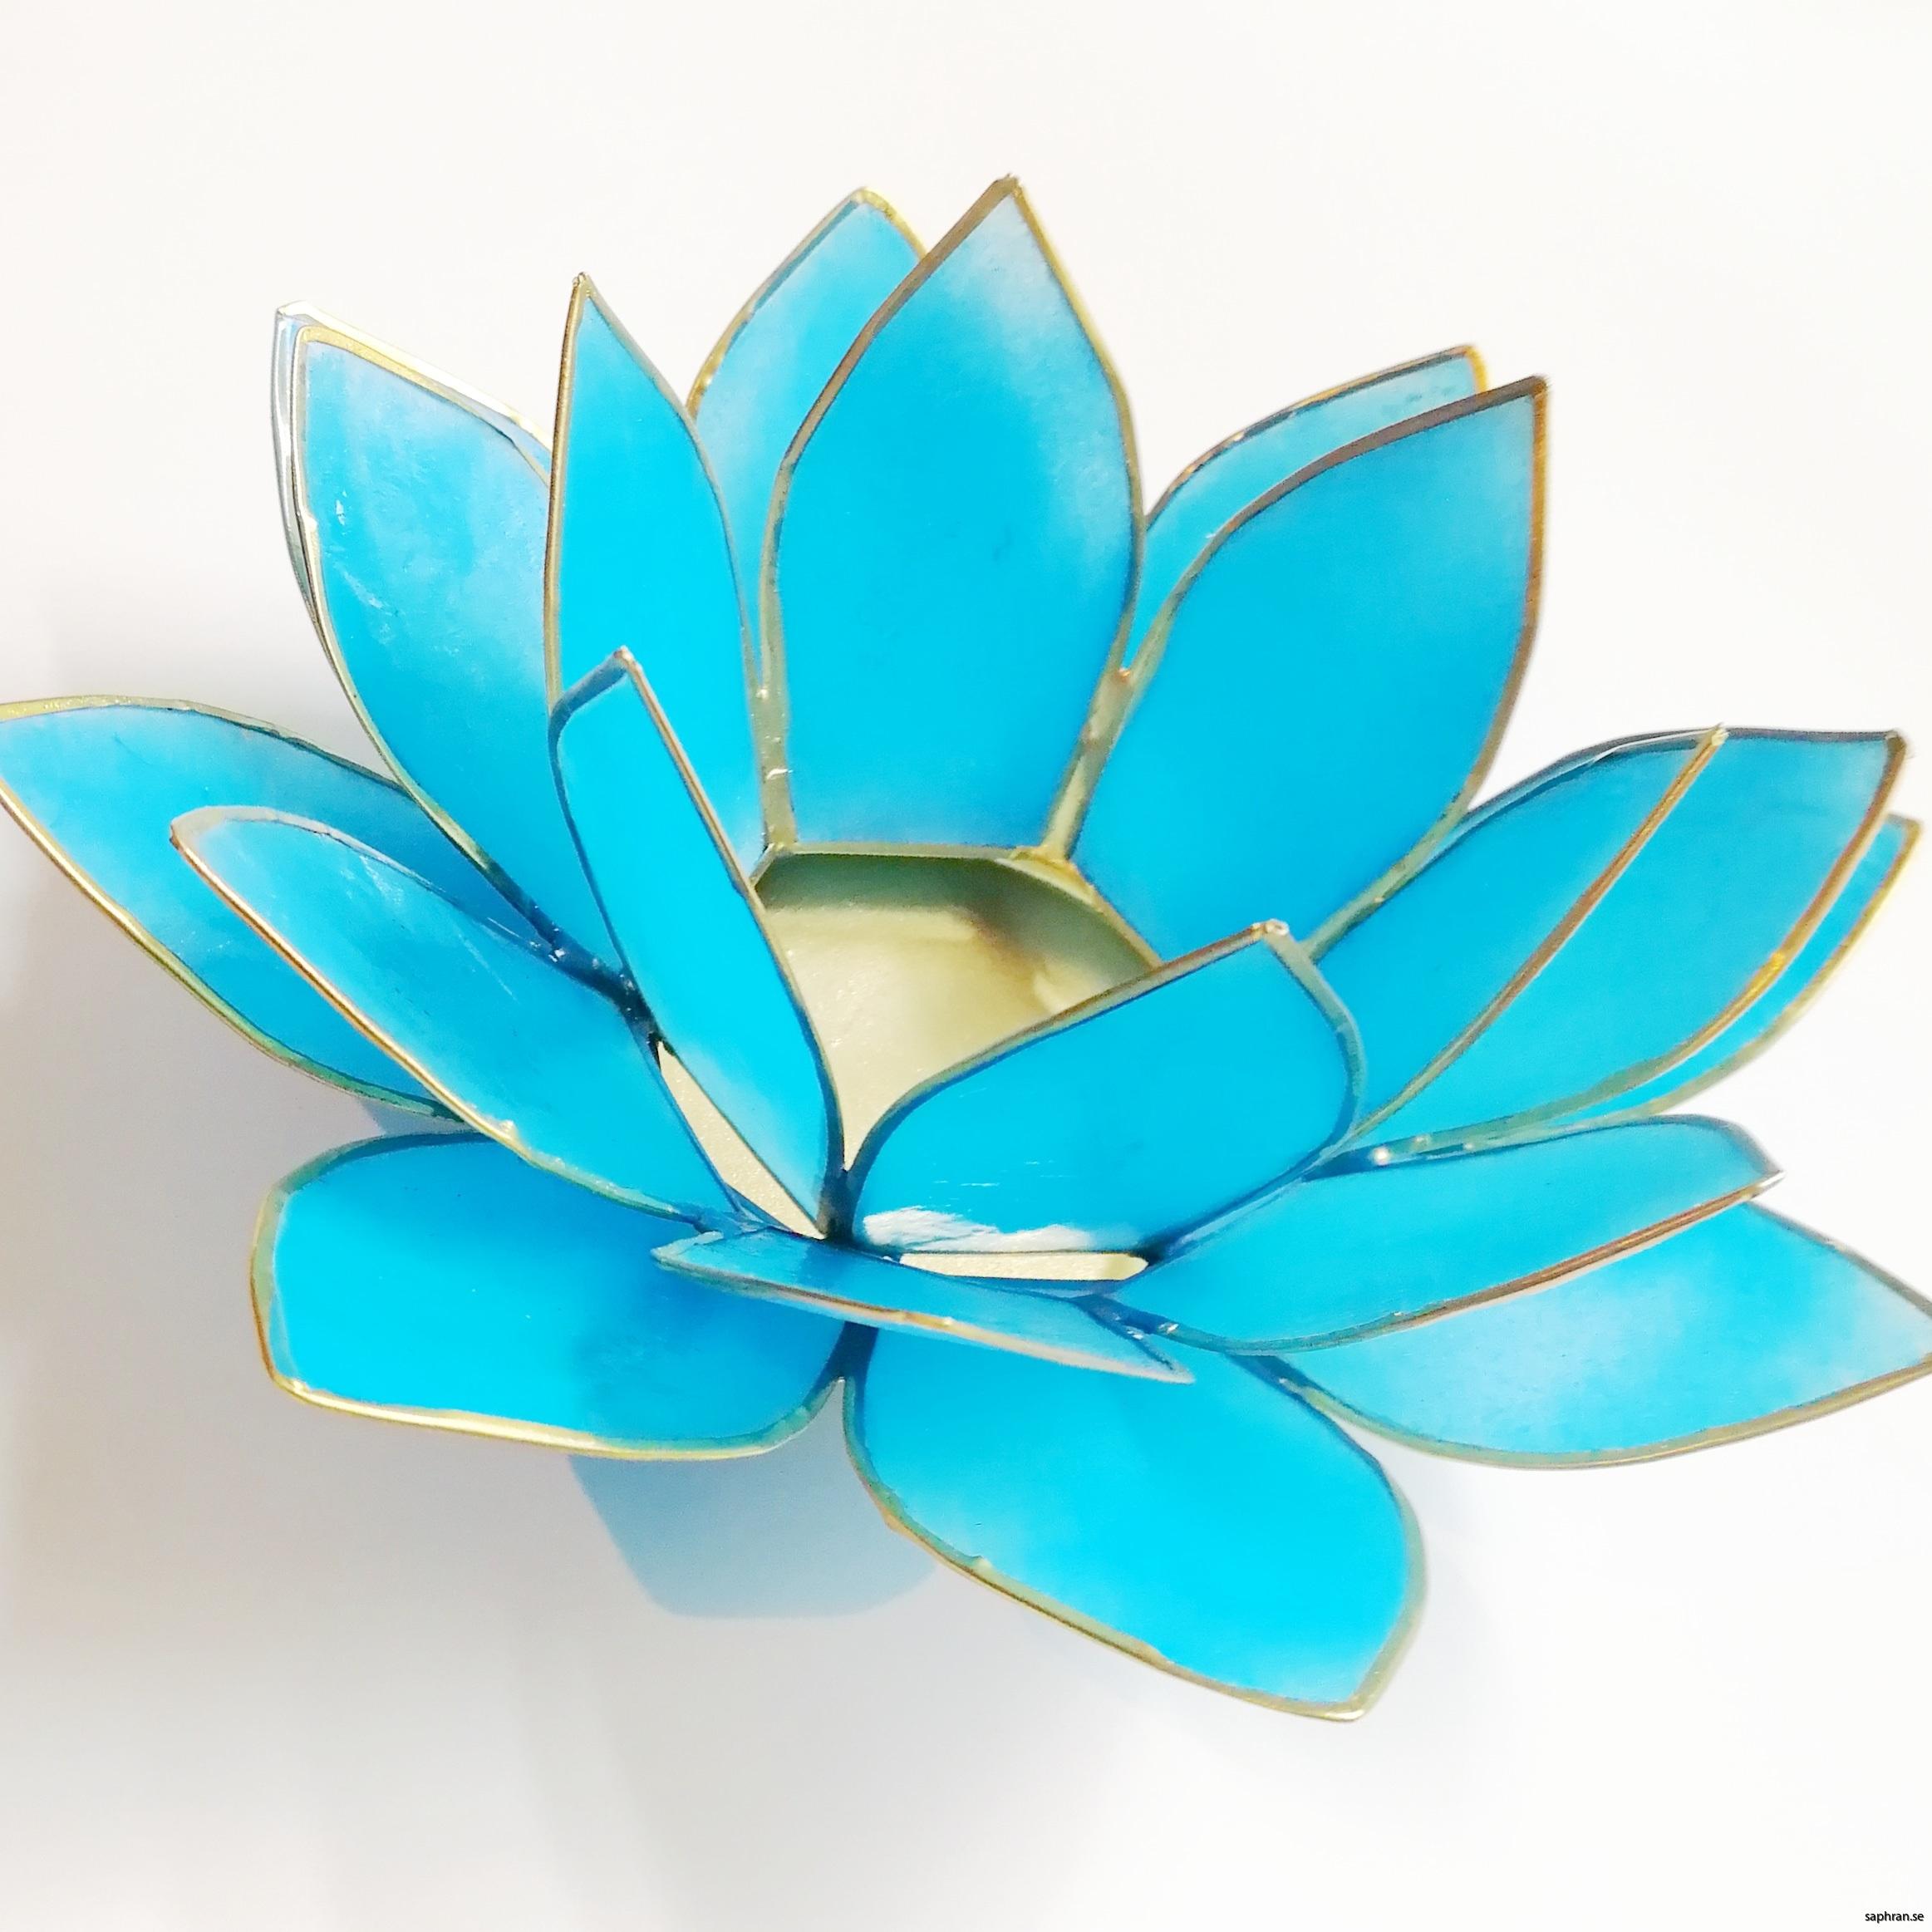 Lotusblomma ljuslykta 7 färger, turkos